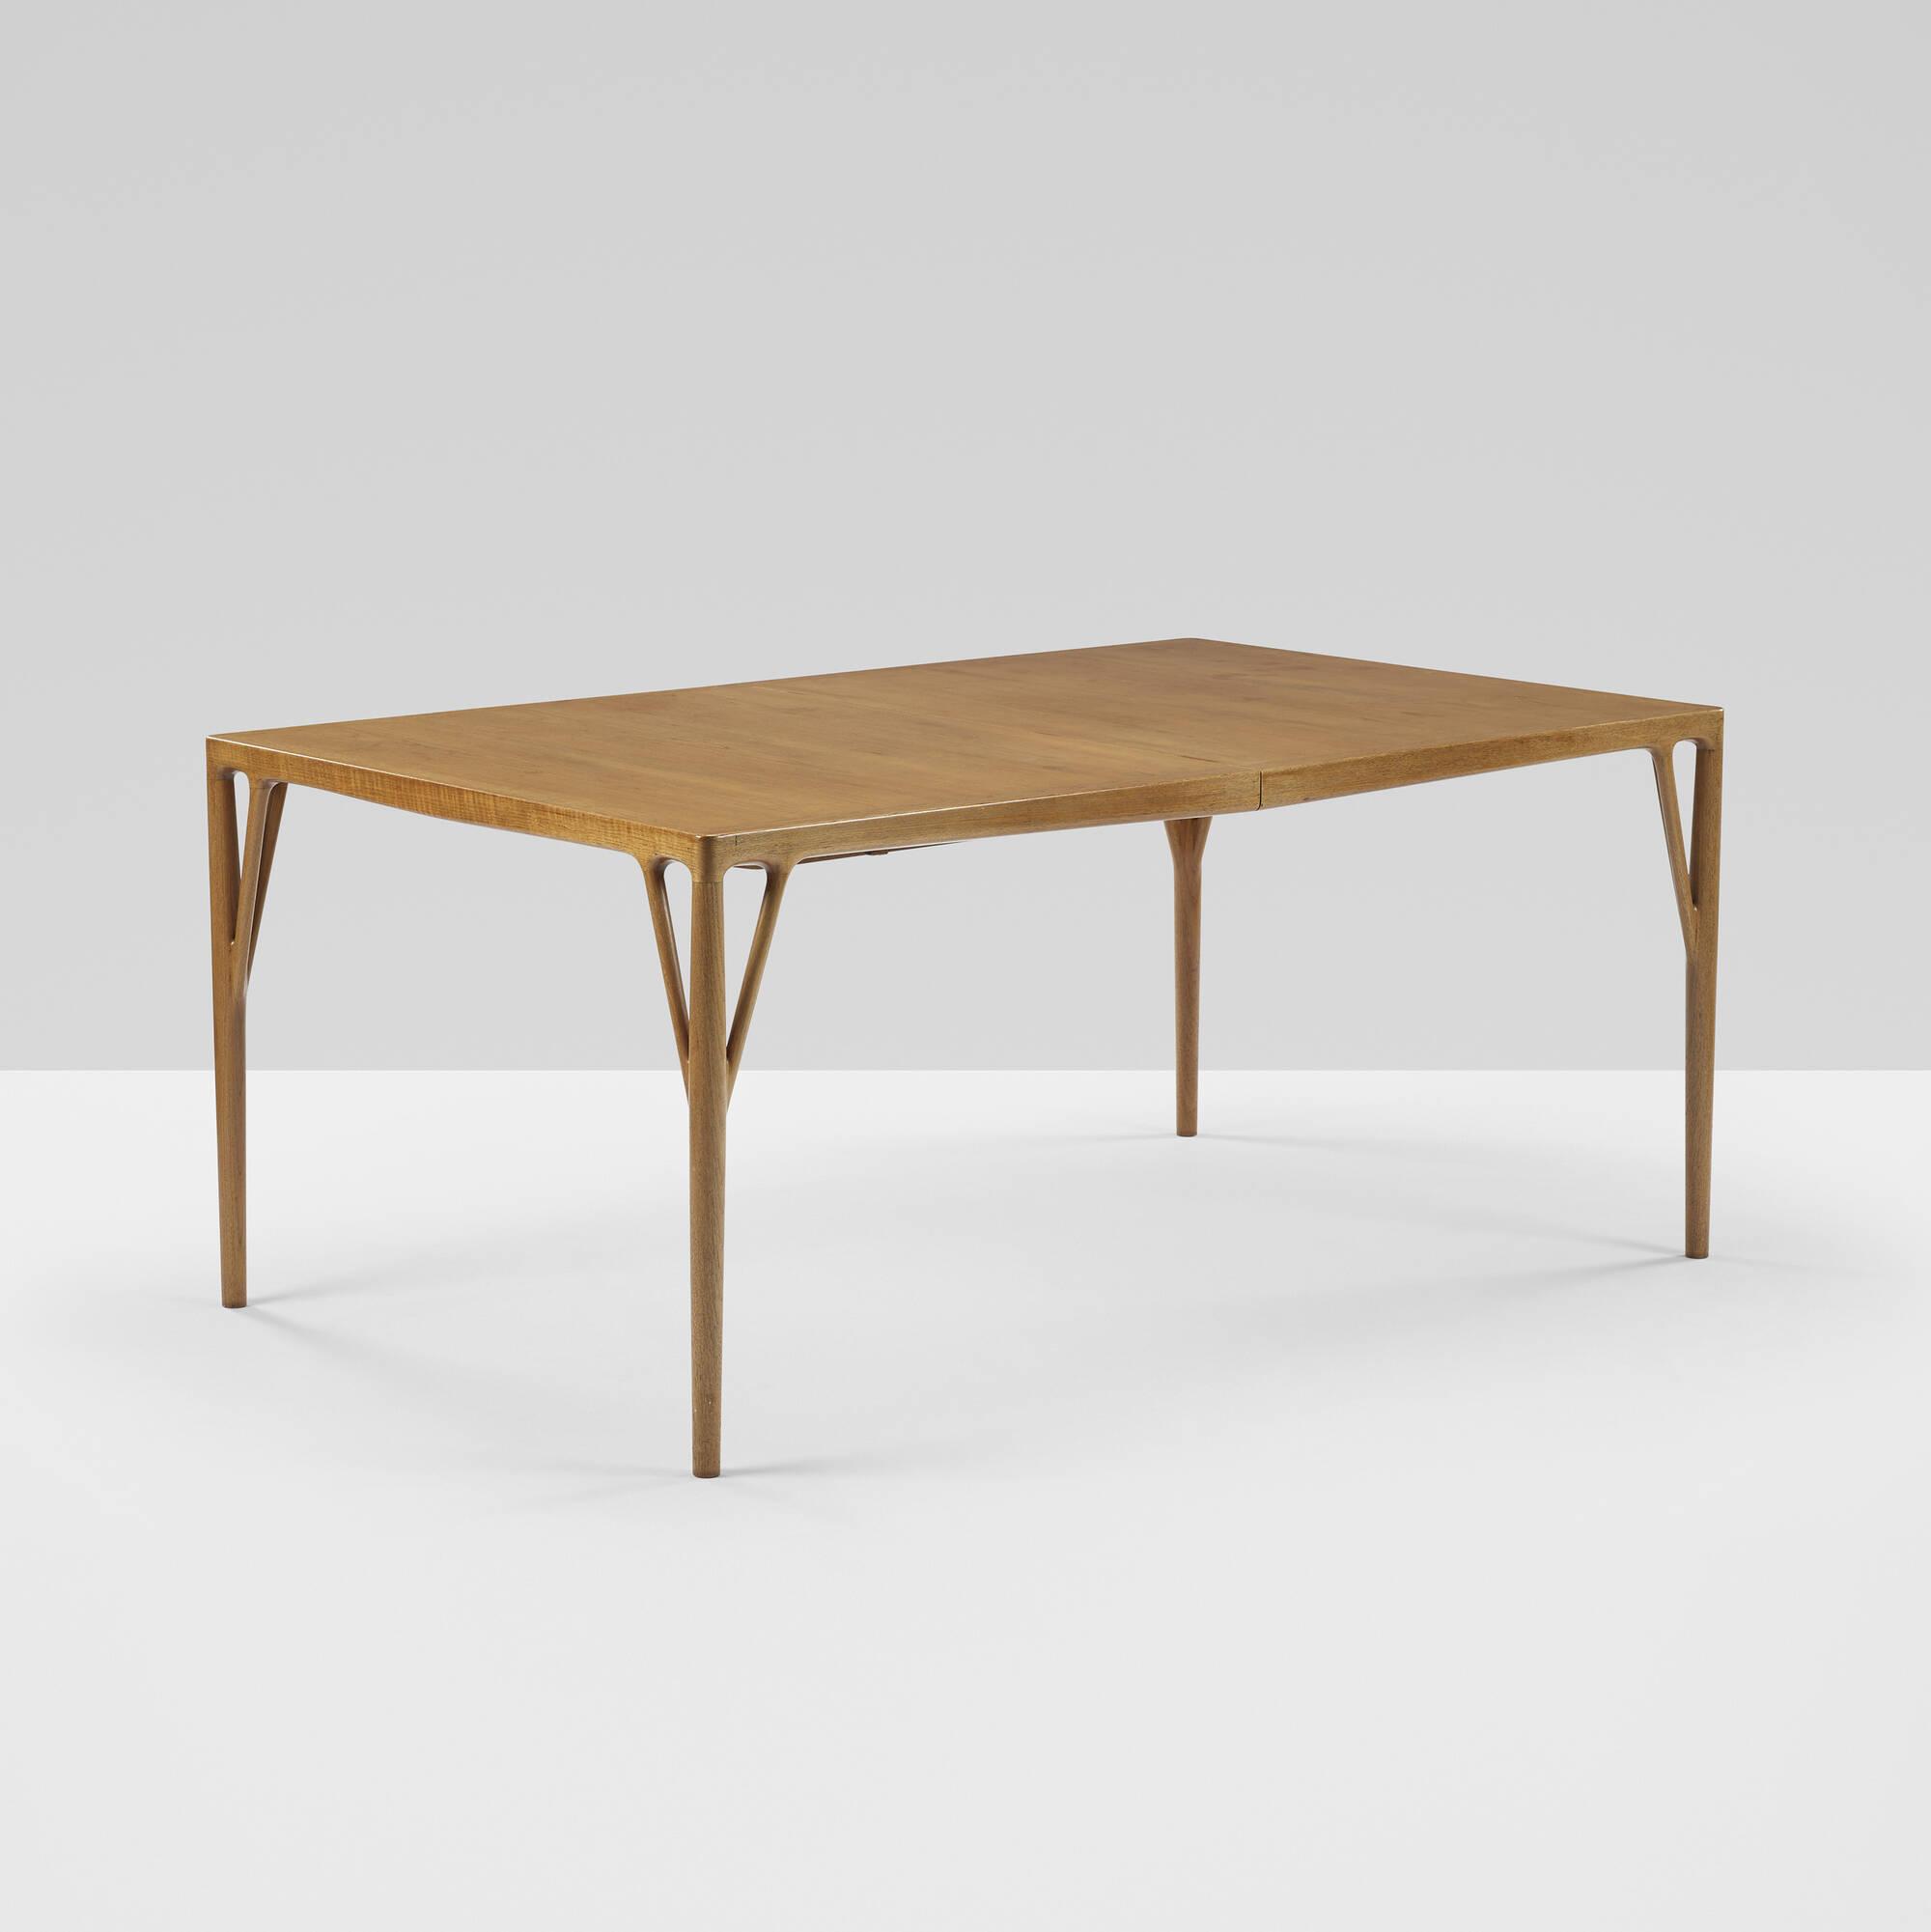 211 helge vestergaard jensen dining table for Dining table design 2015